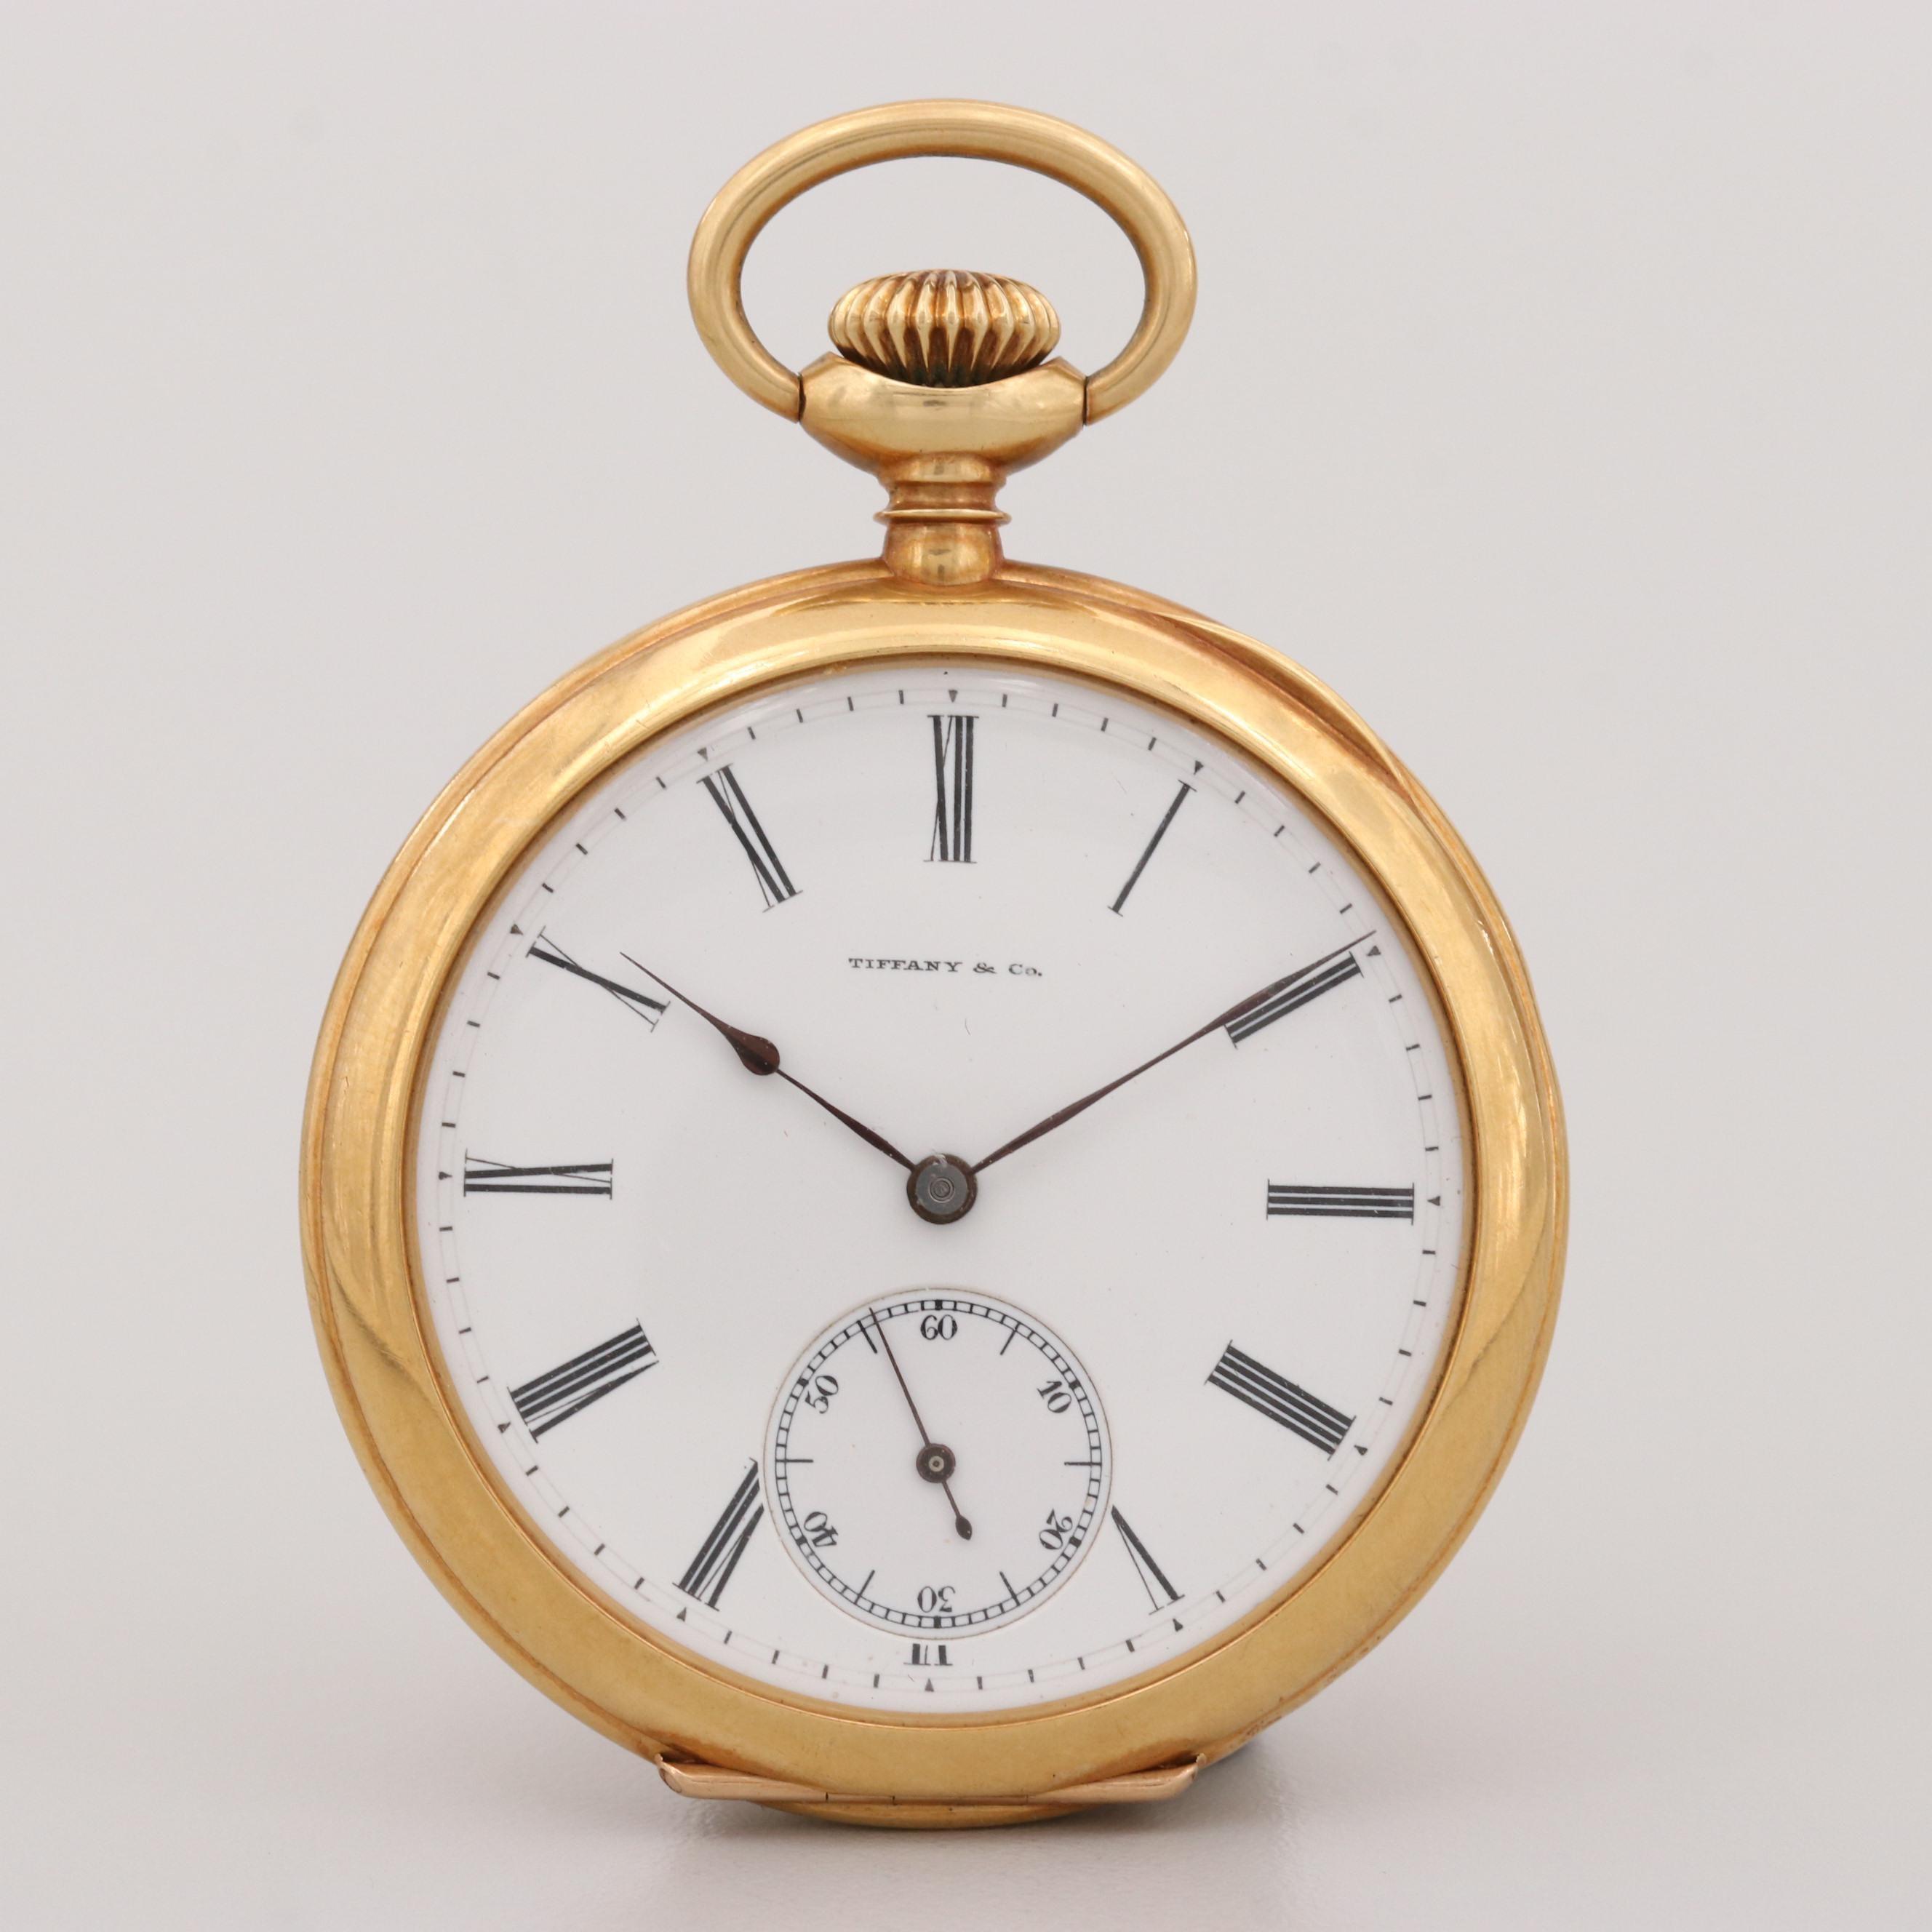 Tiffany & Co. 18K Yellow Gold Pocket Watch, 1910